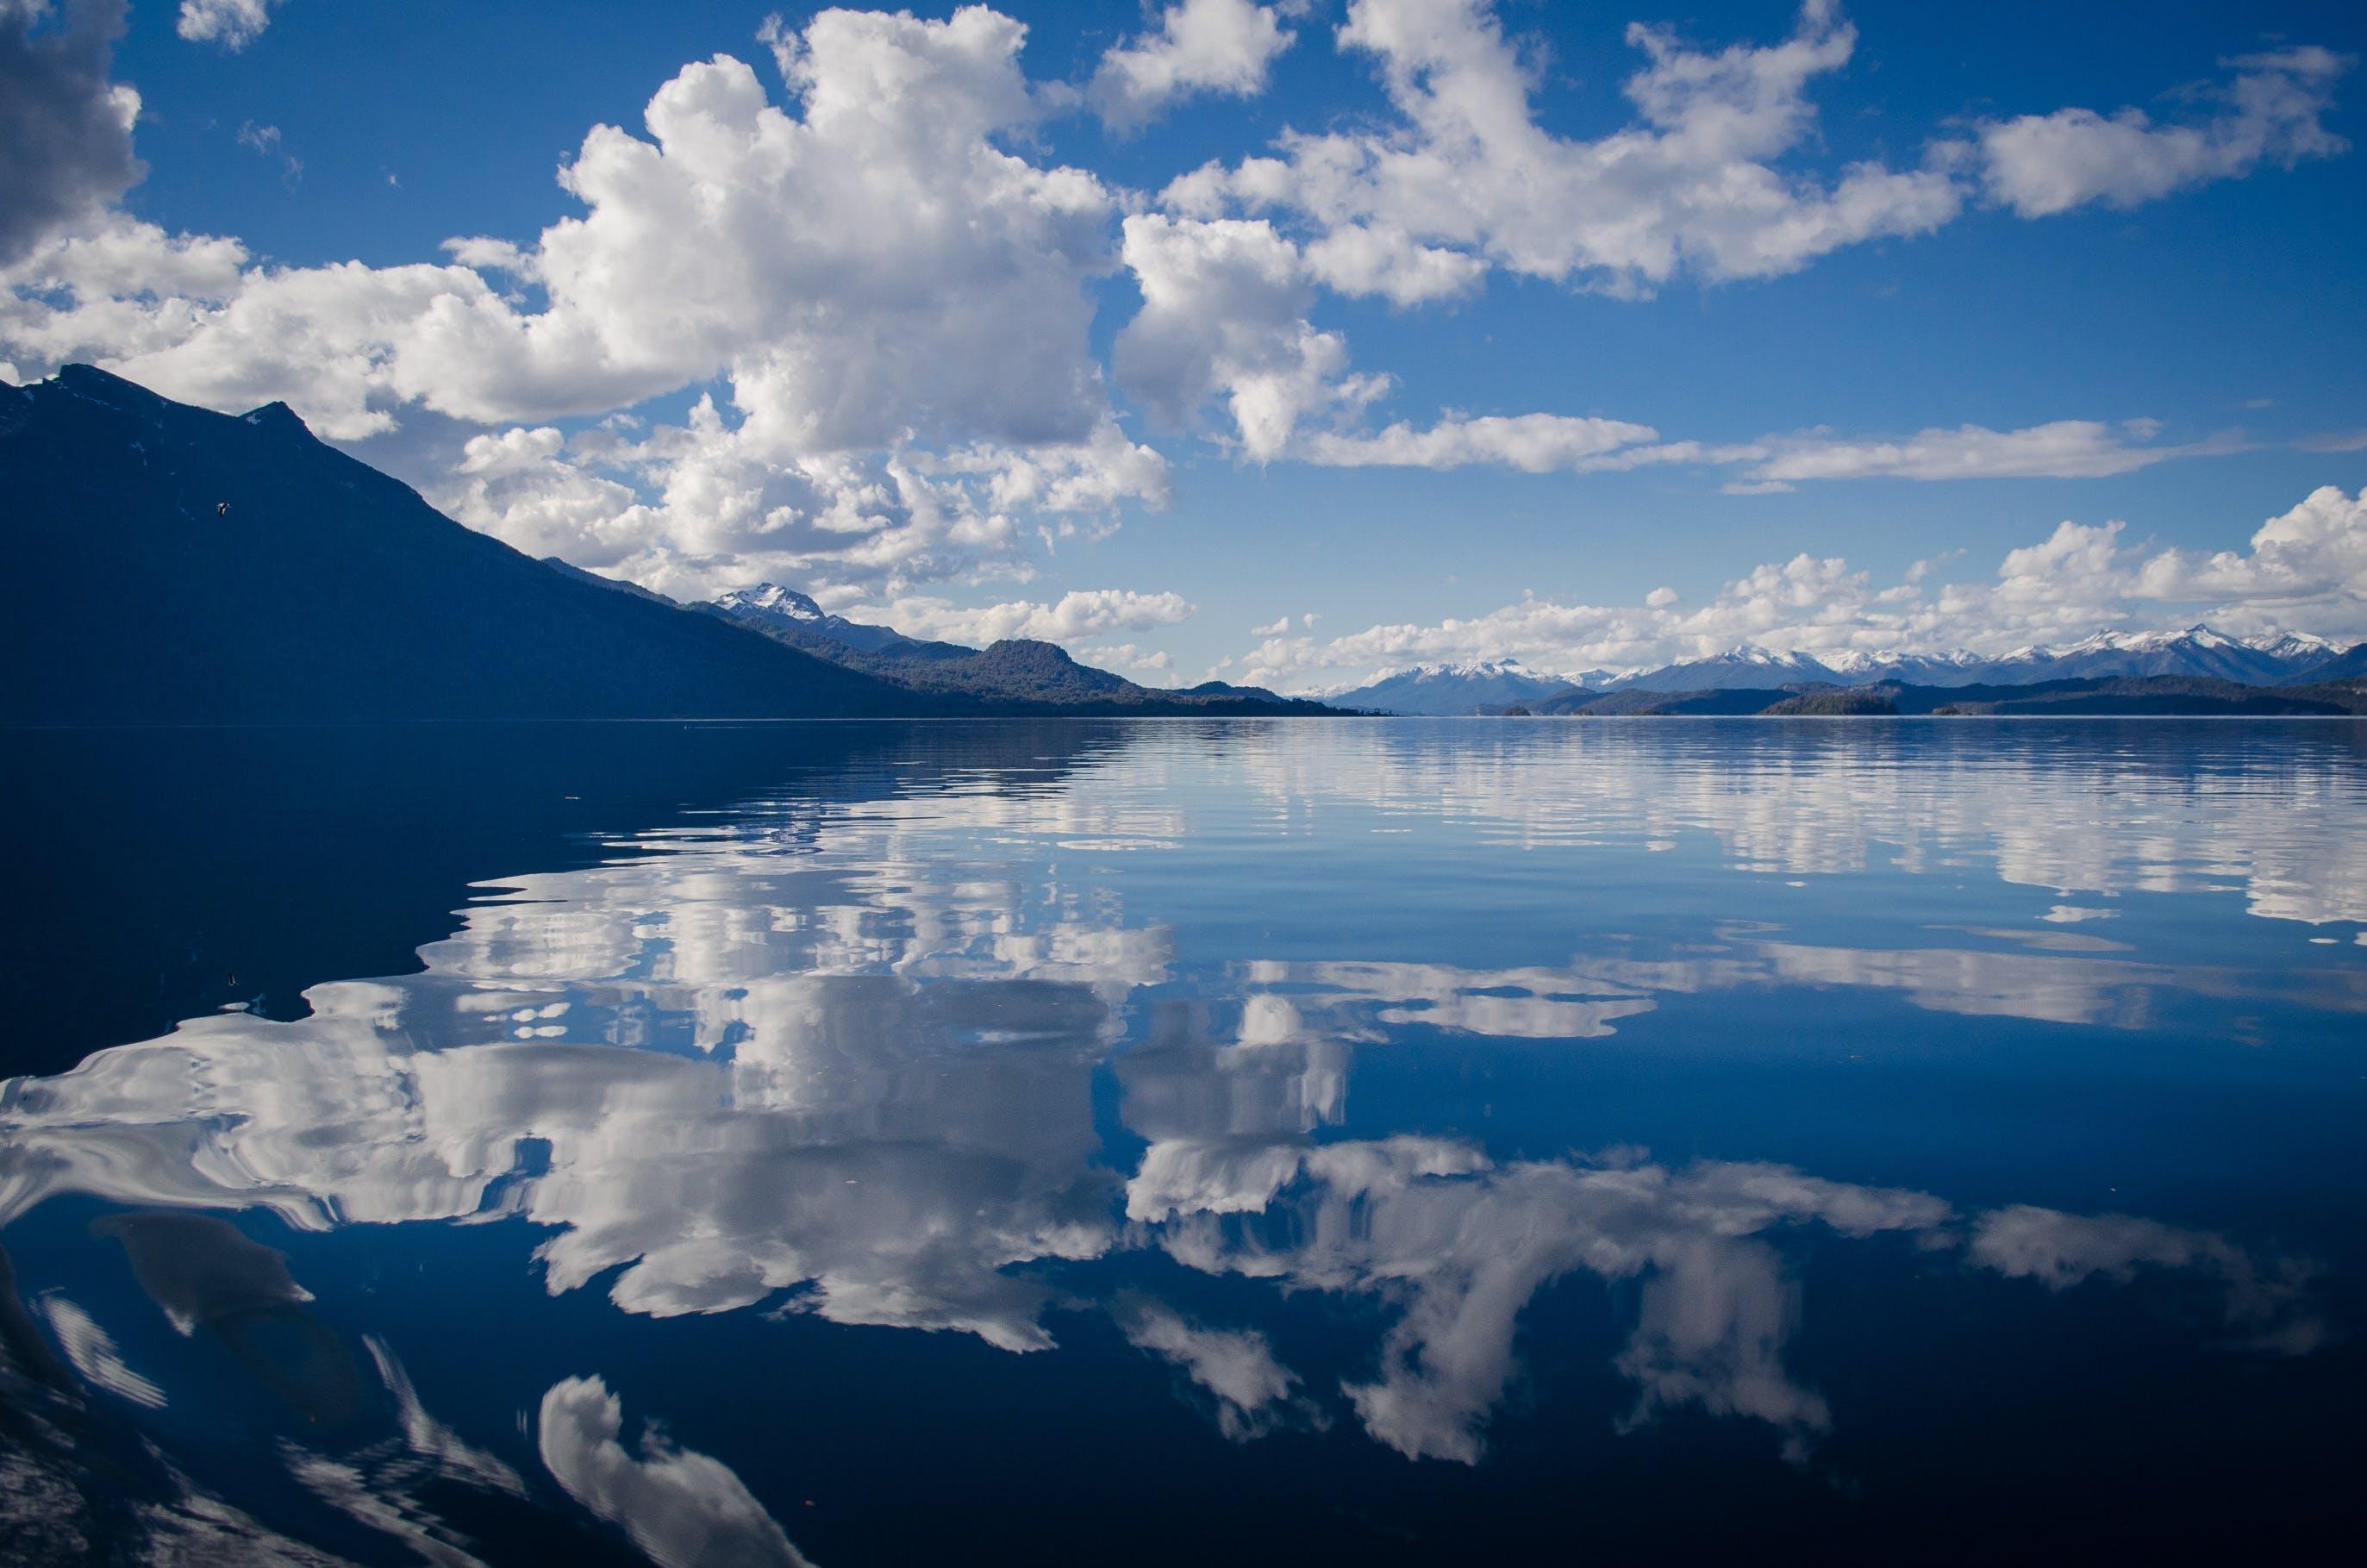 Lake Water Under White and Blue Skies during Daytime